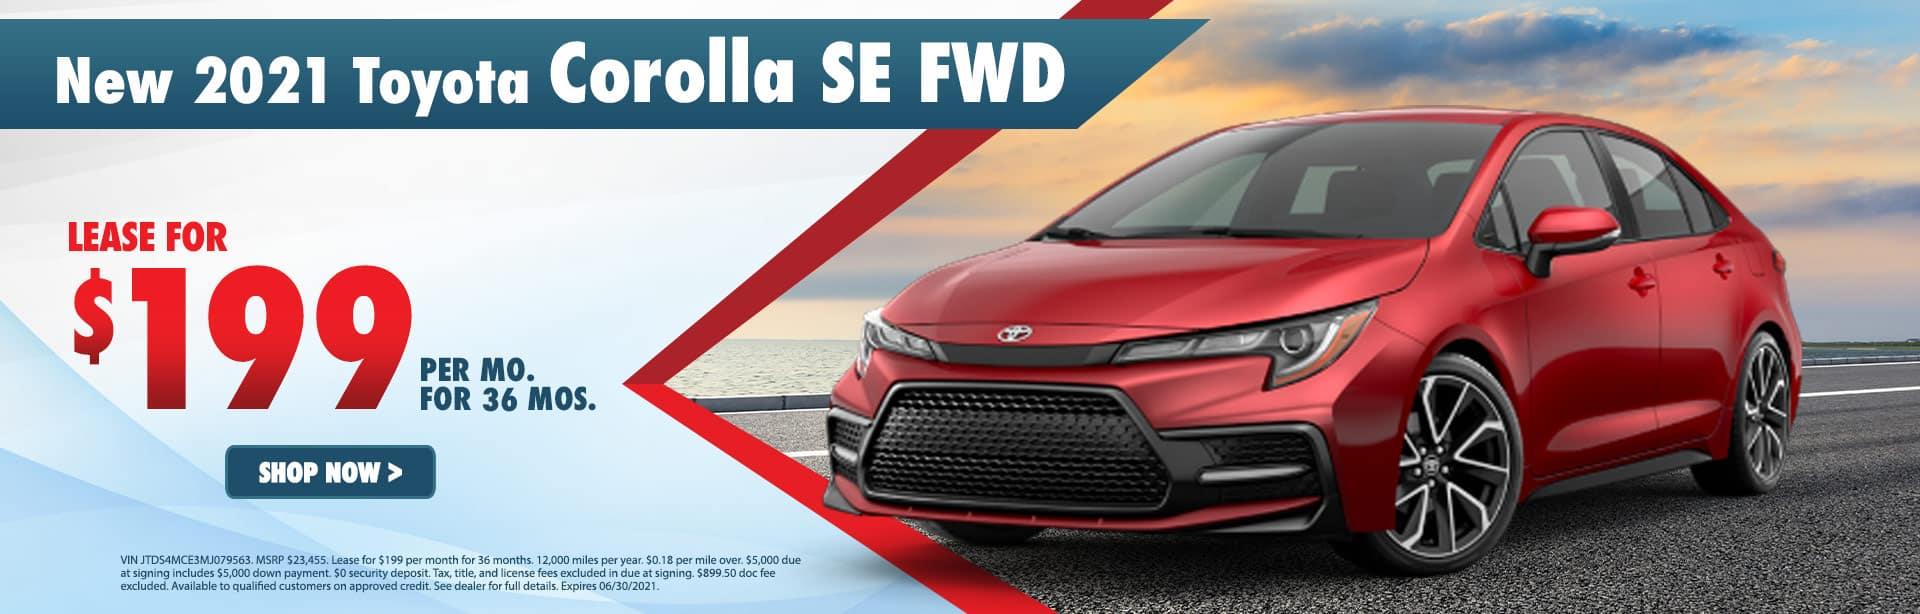 BobTyler_Toyota_webslide_Corolla_06-21